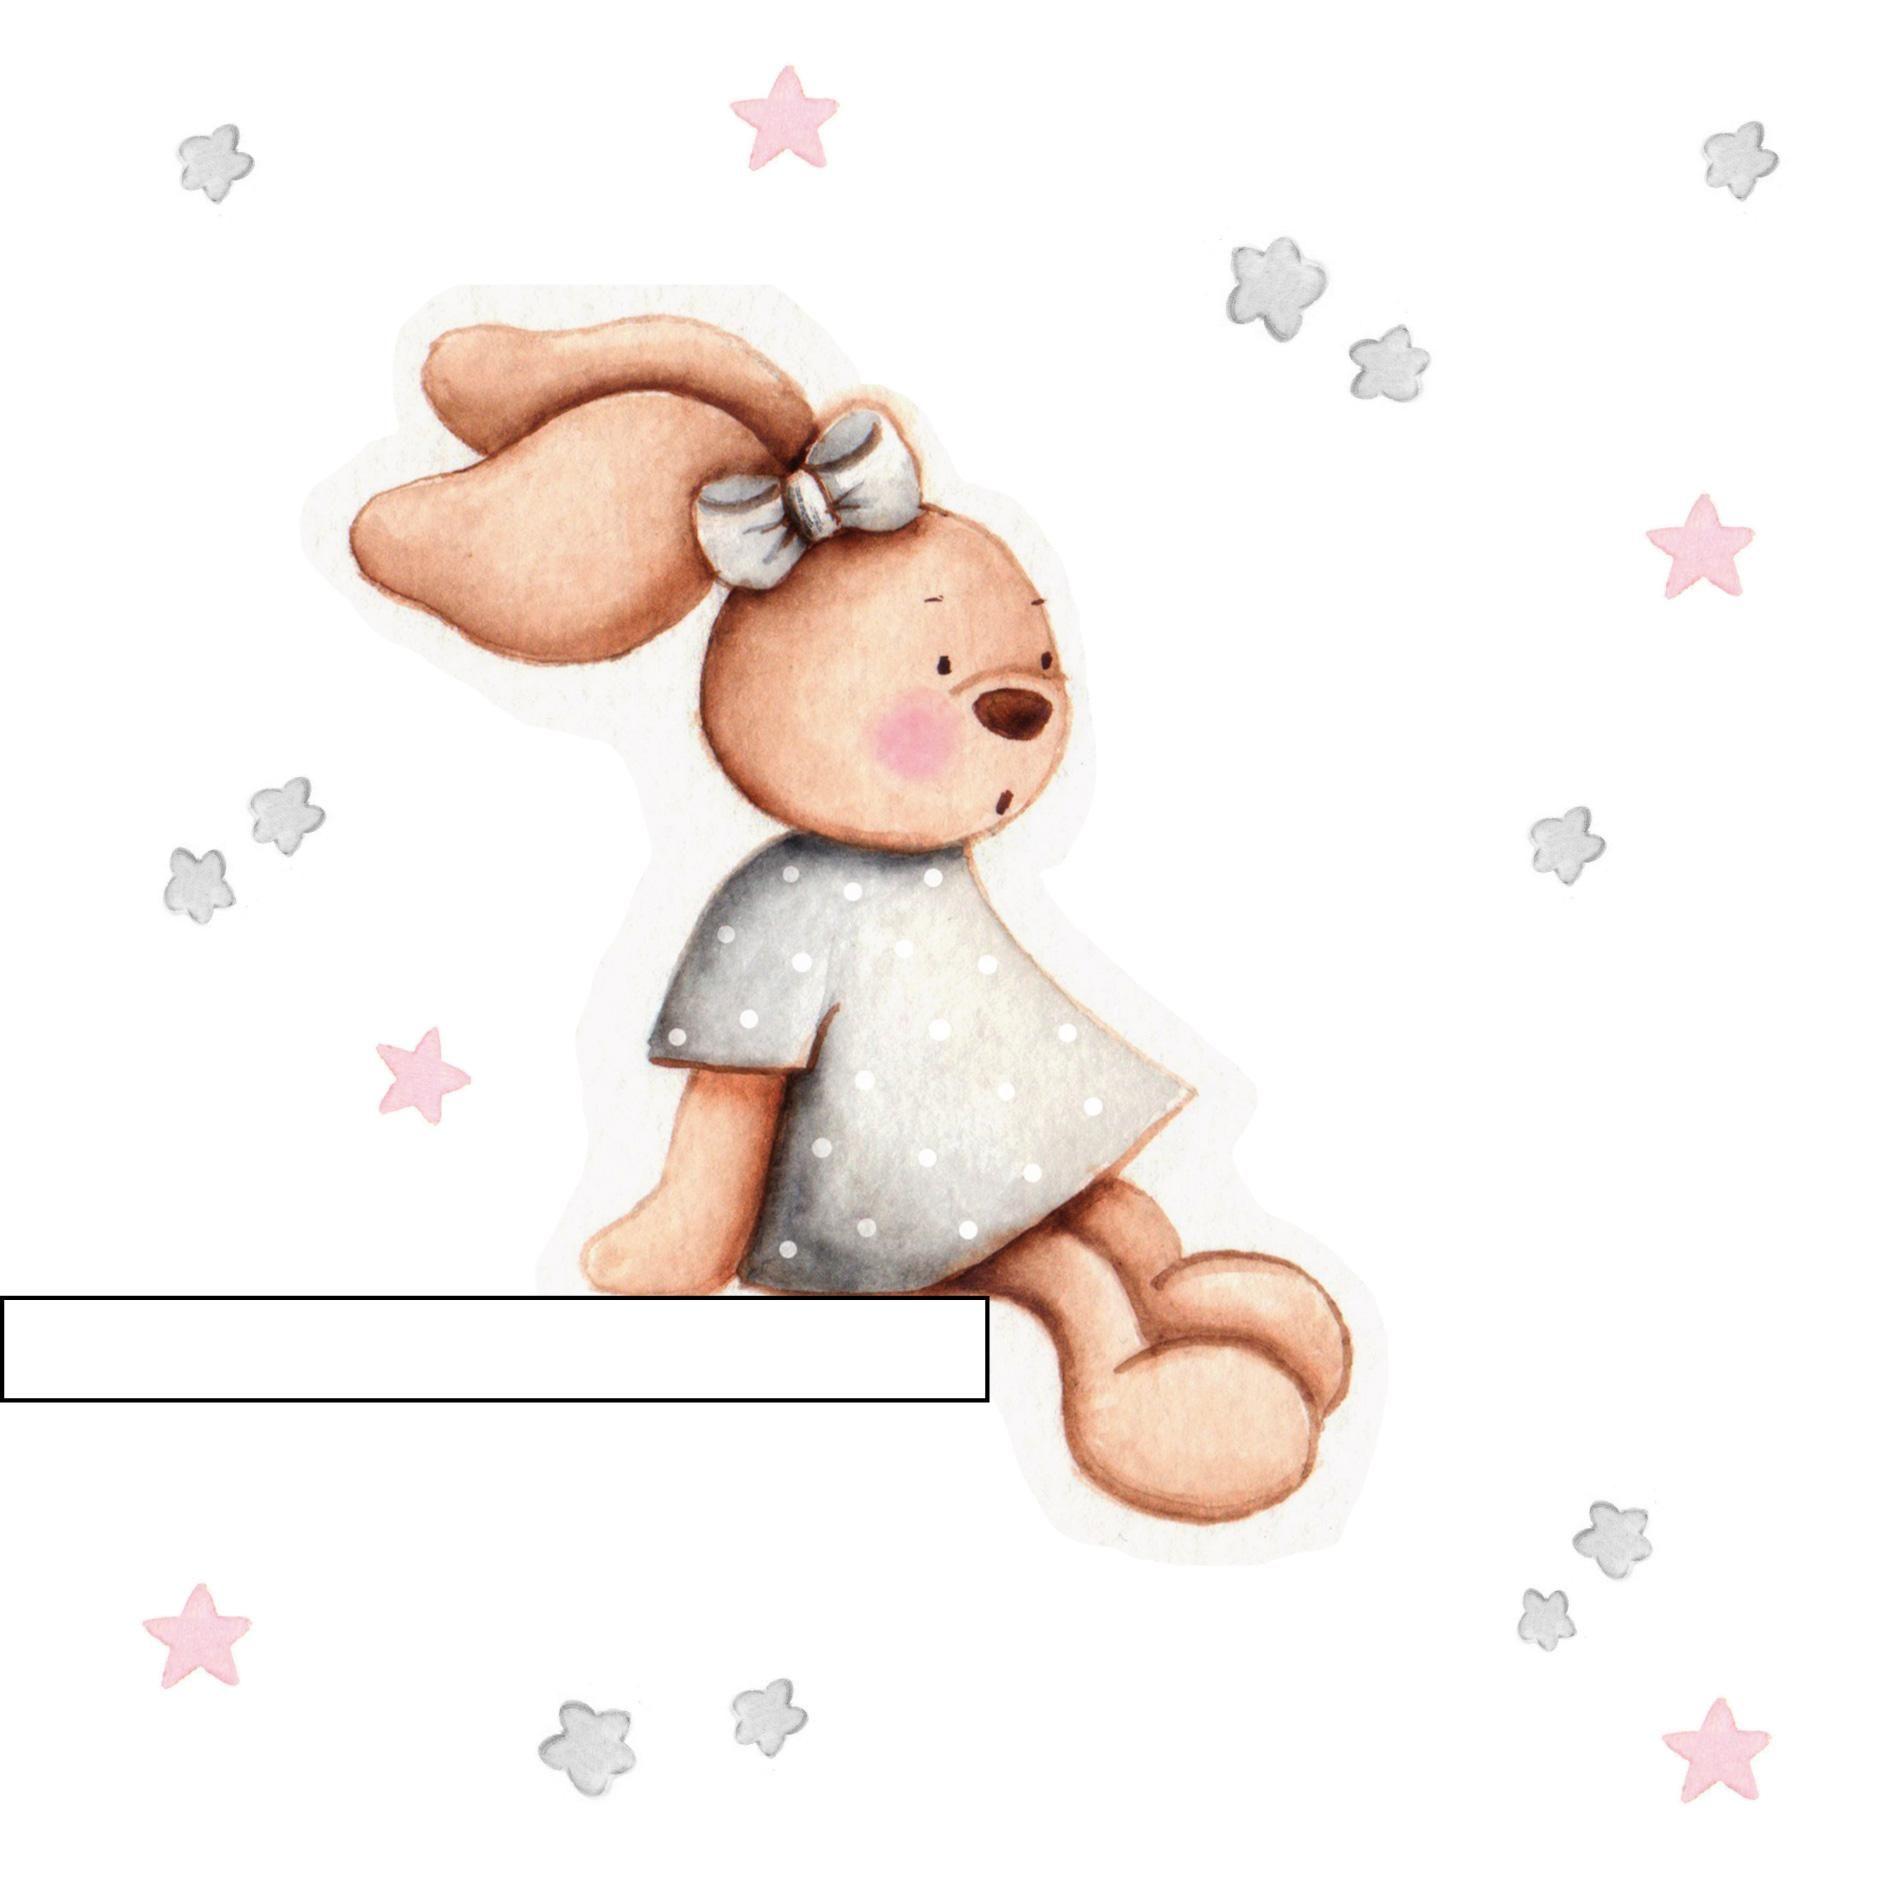 Vinilo Infantil Conejita Sentada En Estanteria En Gris Vinilo Infantil Scrapbook De Bebe Cosas Lindas Para Dibujar